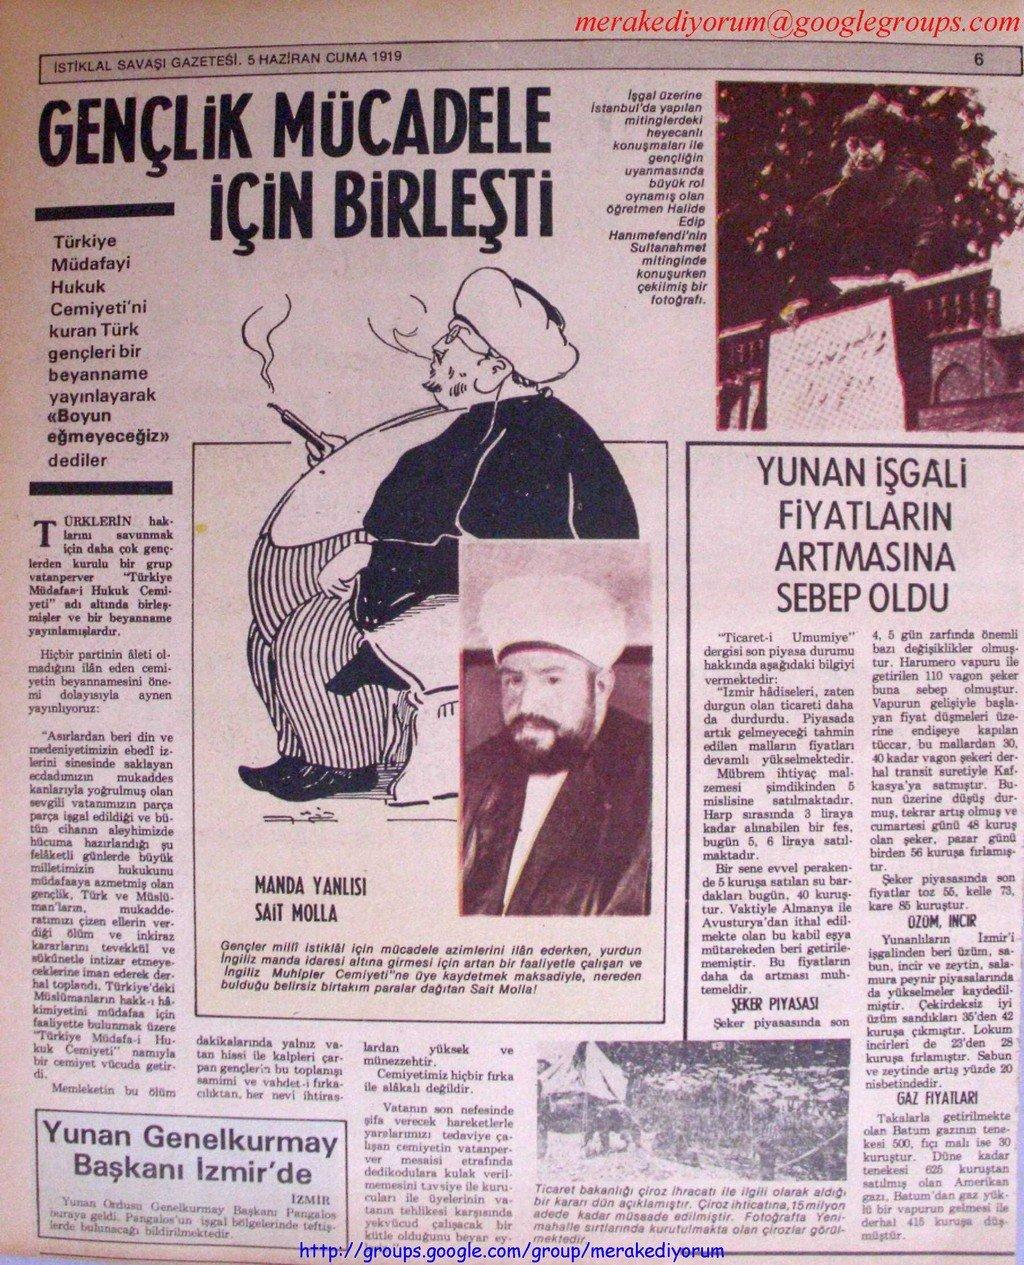 istiklal savaşı gazetesi - 05 Haziran 1919